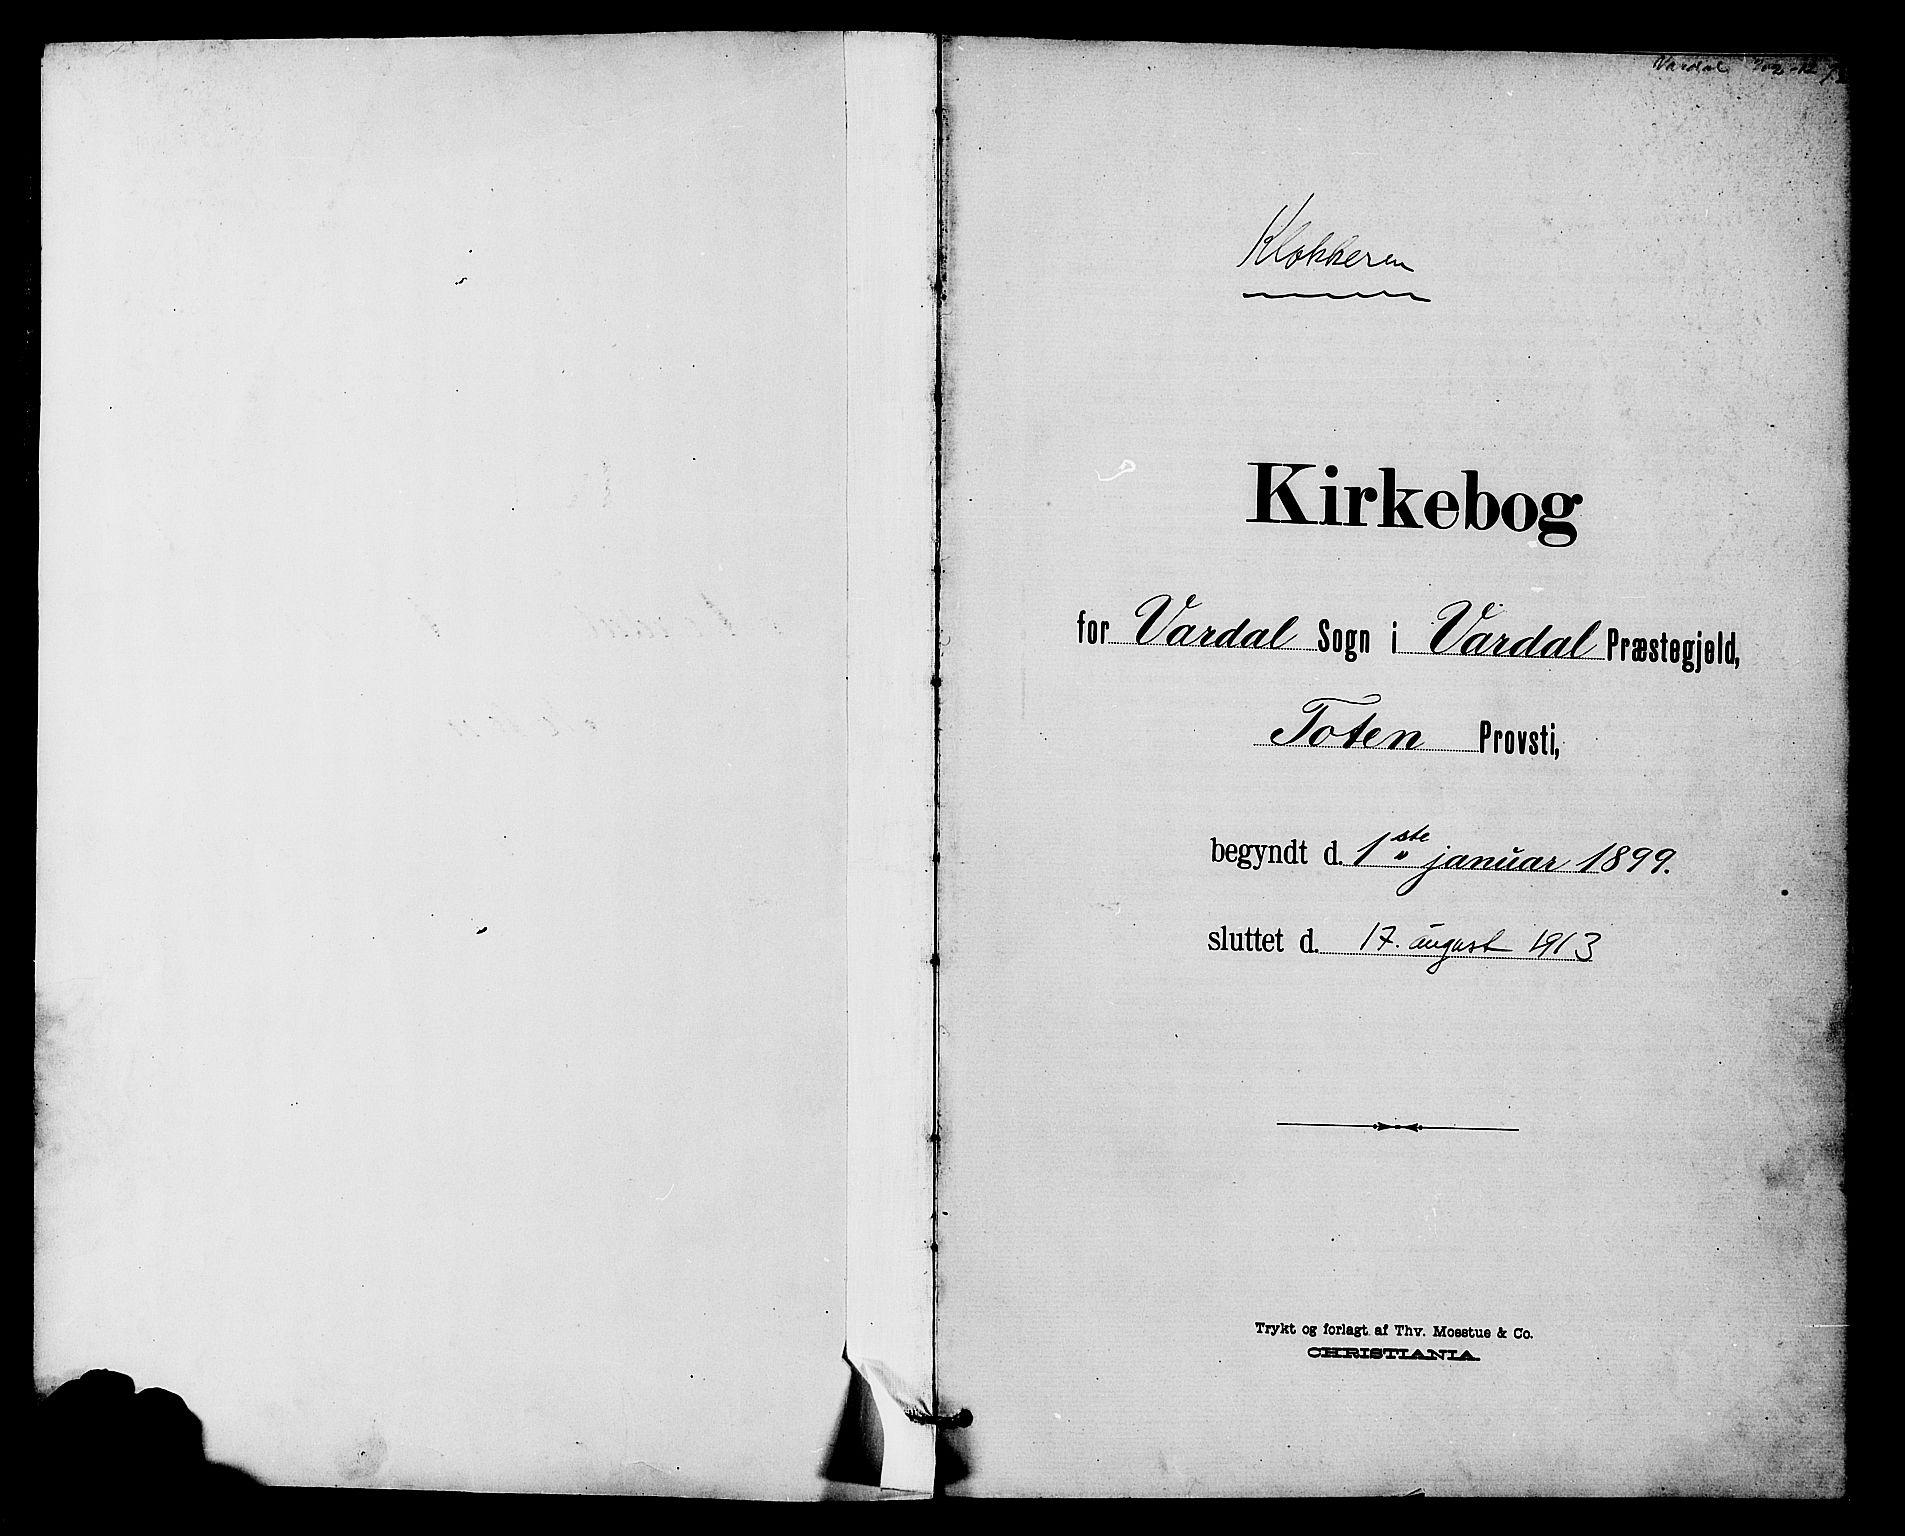 SAH, Vardal prestekontor, H/Ha/Hab/L0011: Klokkerbok nr. 11, 1899-1913, s. 1